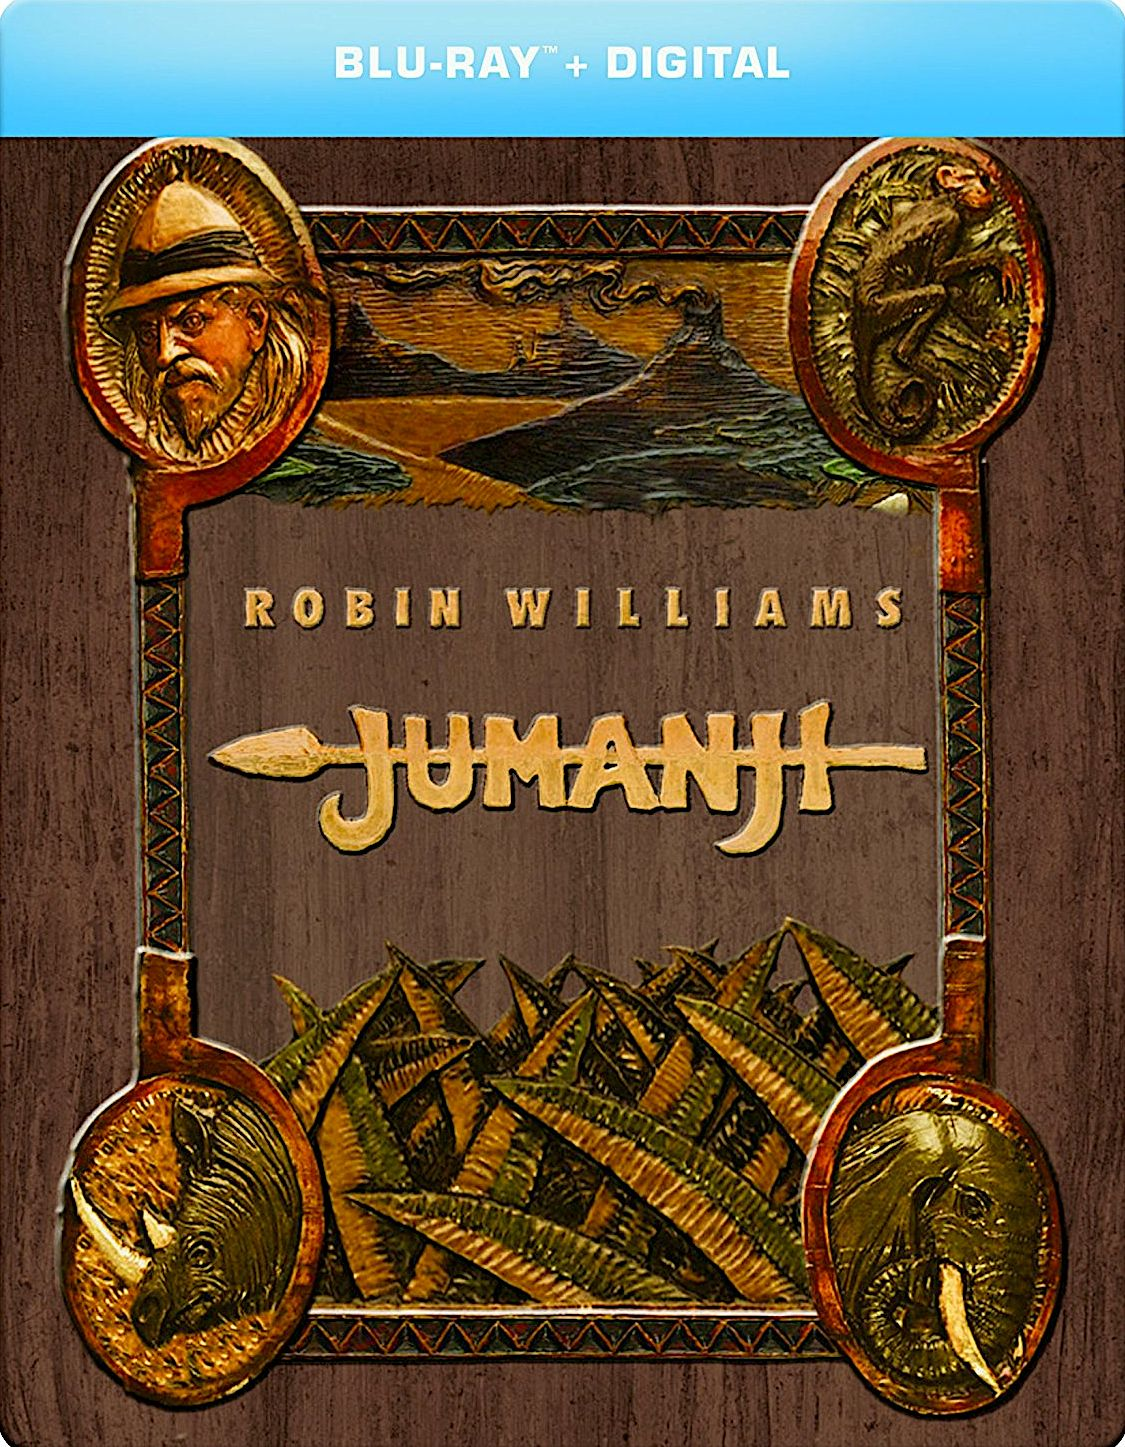 JUMANJI BLURAY STEELBOOK (SONY PICTURES) Jumanji movie